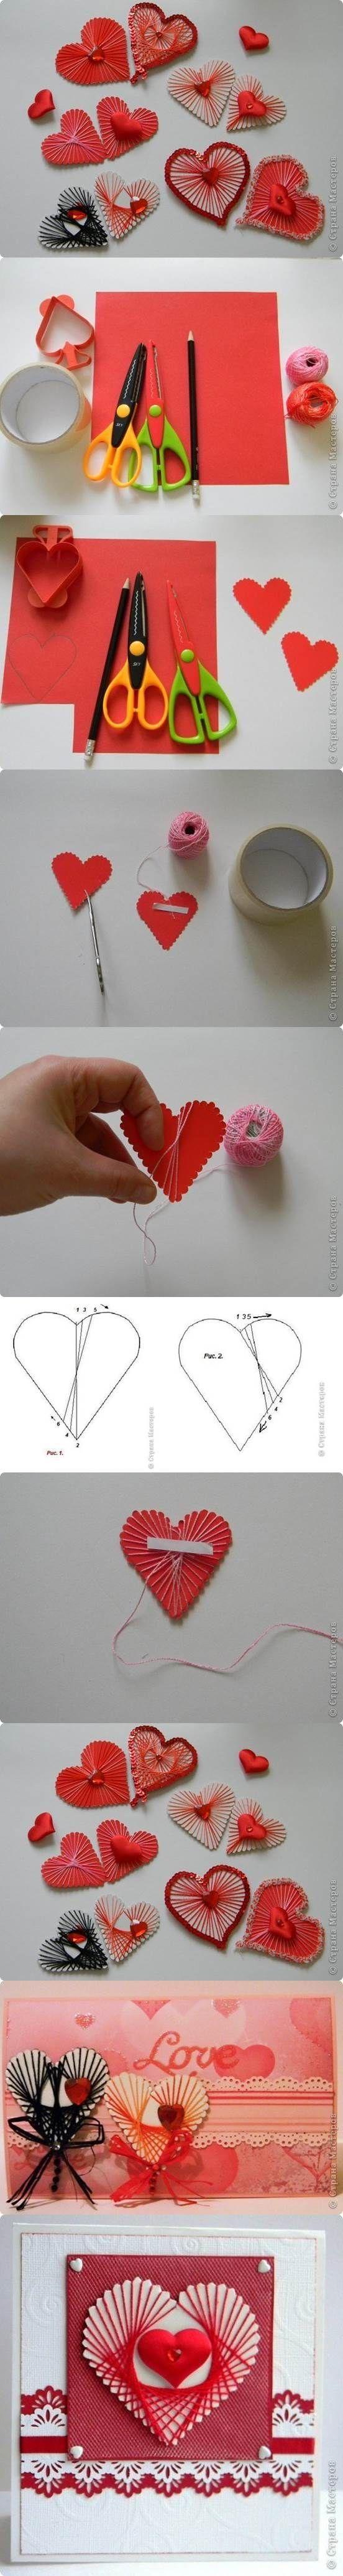 DIY Unique Yarn Heart Decoration | iCreativeIdeas.com Like Us on Facebook ==> https://www.facebook.com/icreativeideas